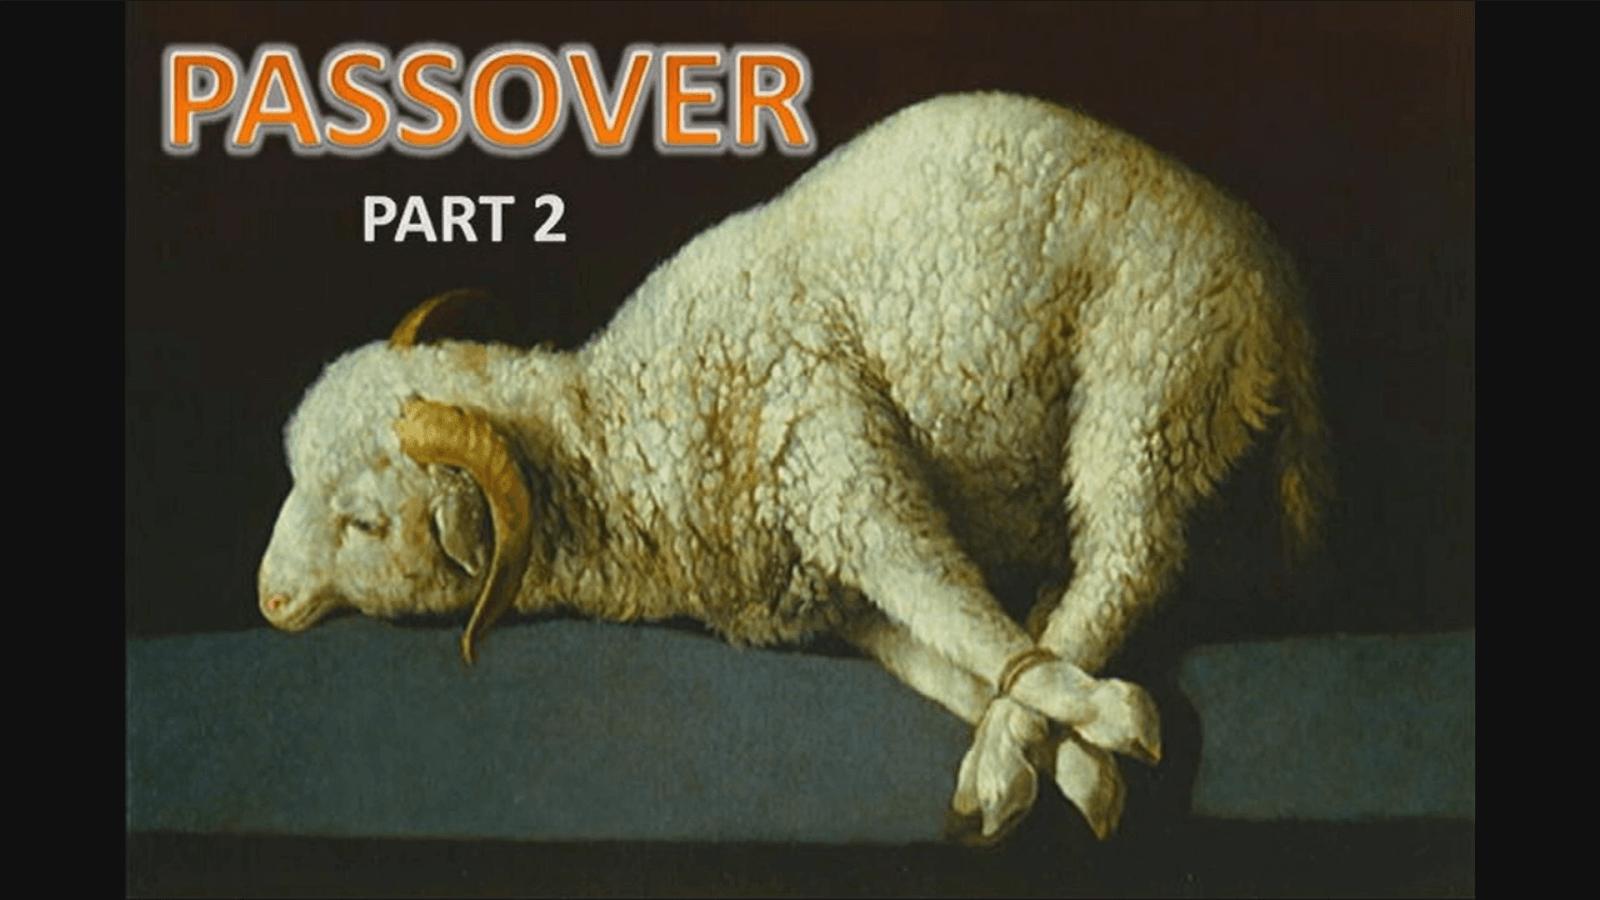 Passover - Part 2 - Study